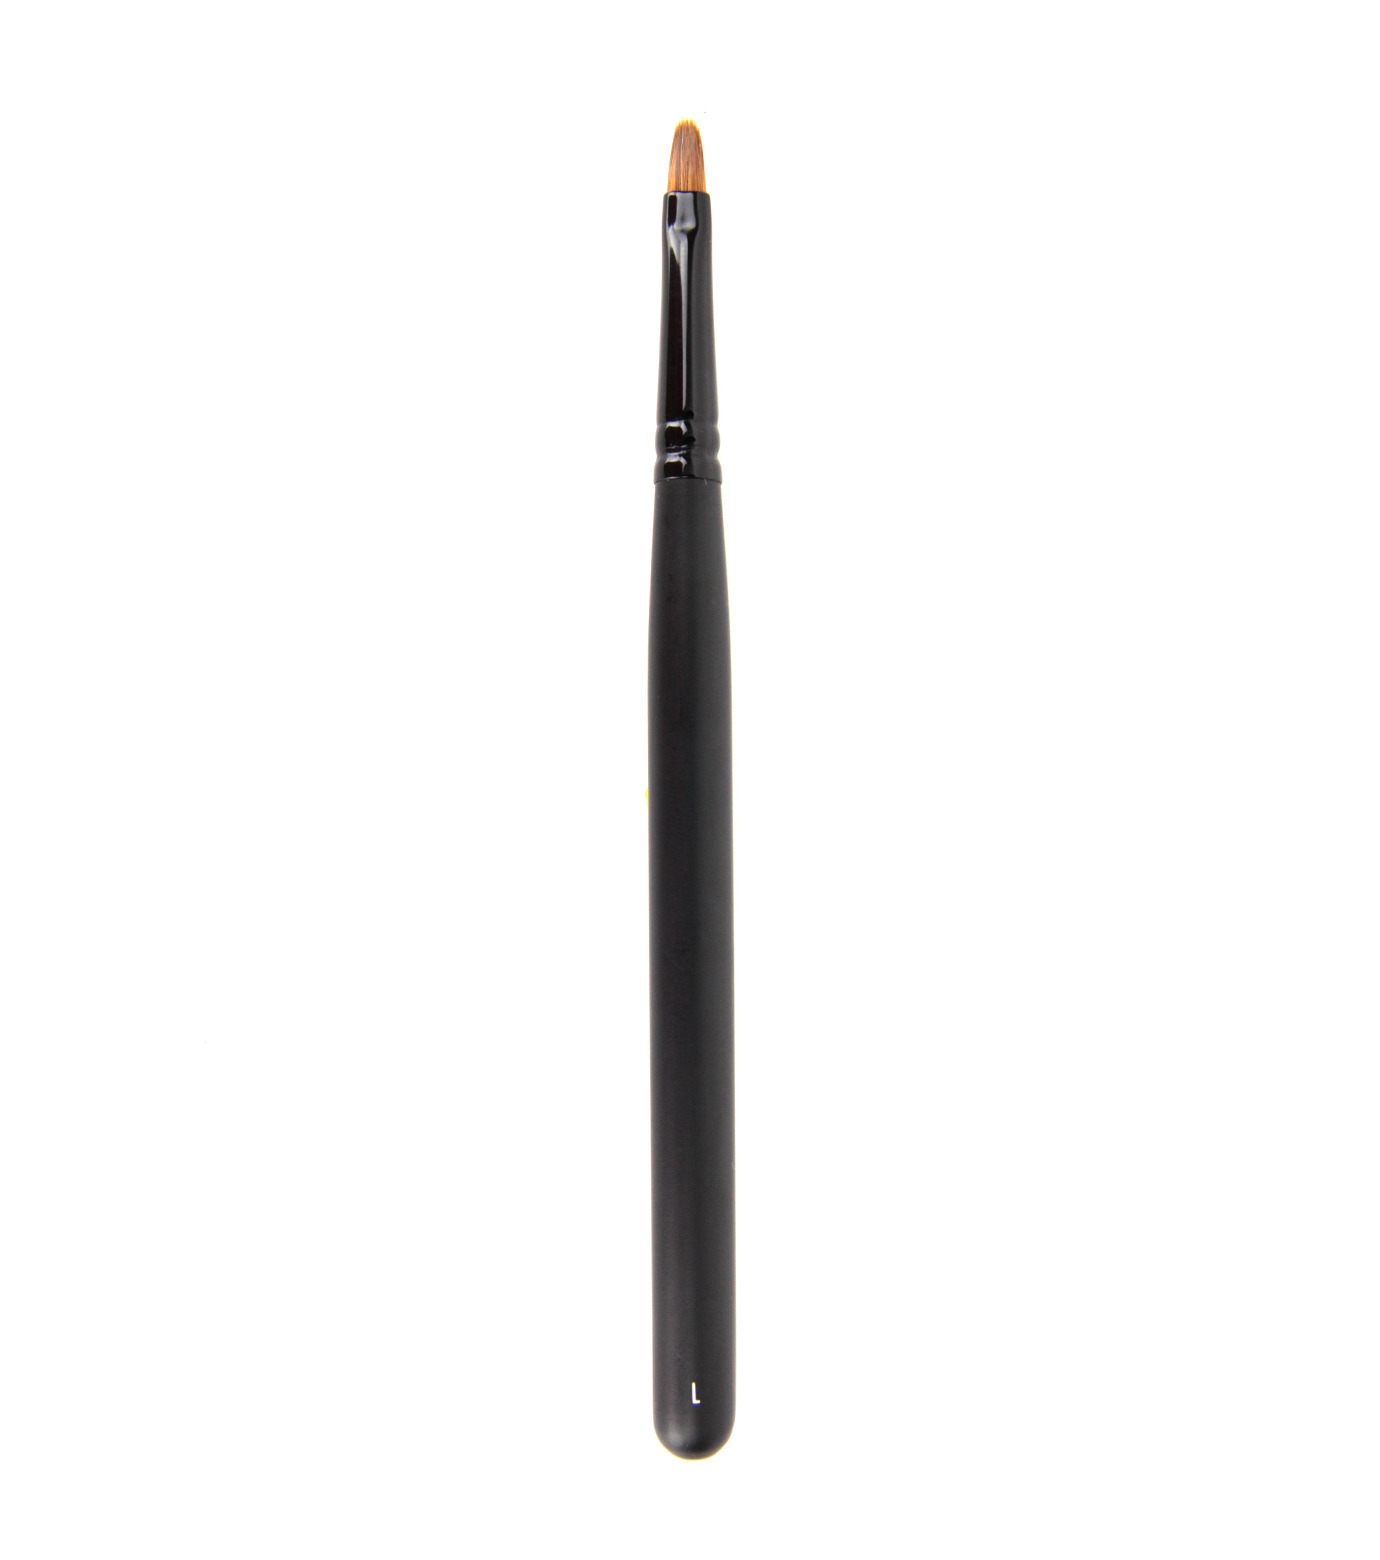 GRANJE(グランジェ)のGel Brush 1 Round-BLACK(MAKE-UP/MAKE-UP)-910-13 拡大詳細画像2